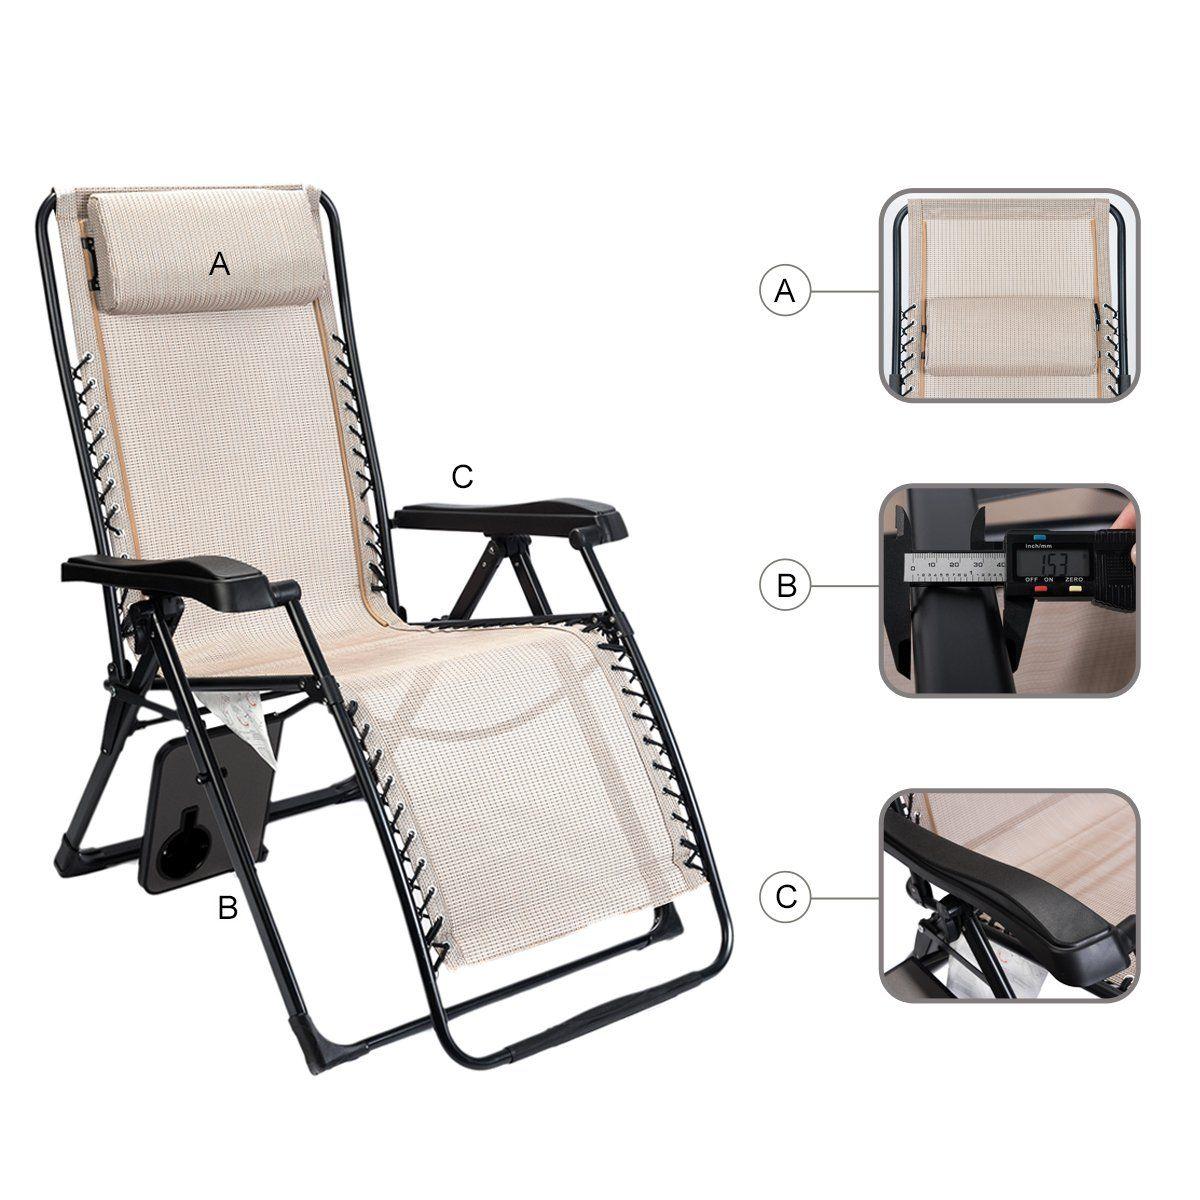 Timber Ridge Zero Gravity Lounge Chair Oversize XL